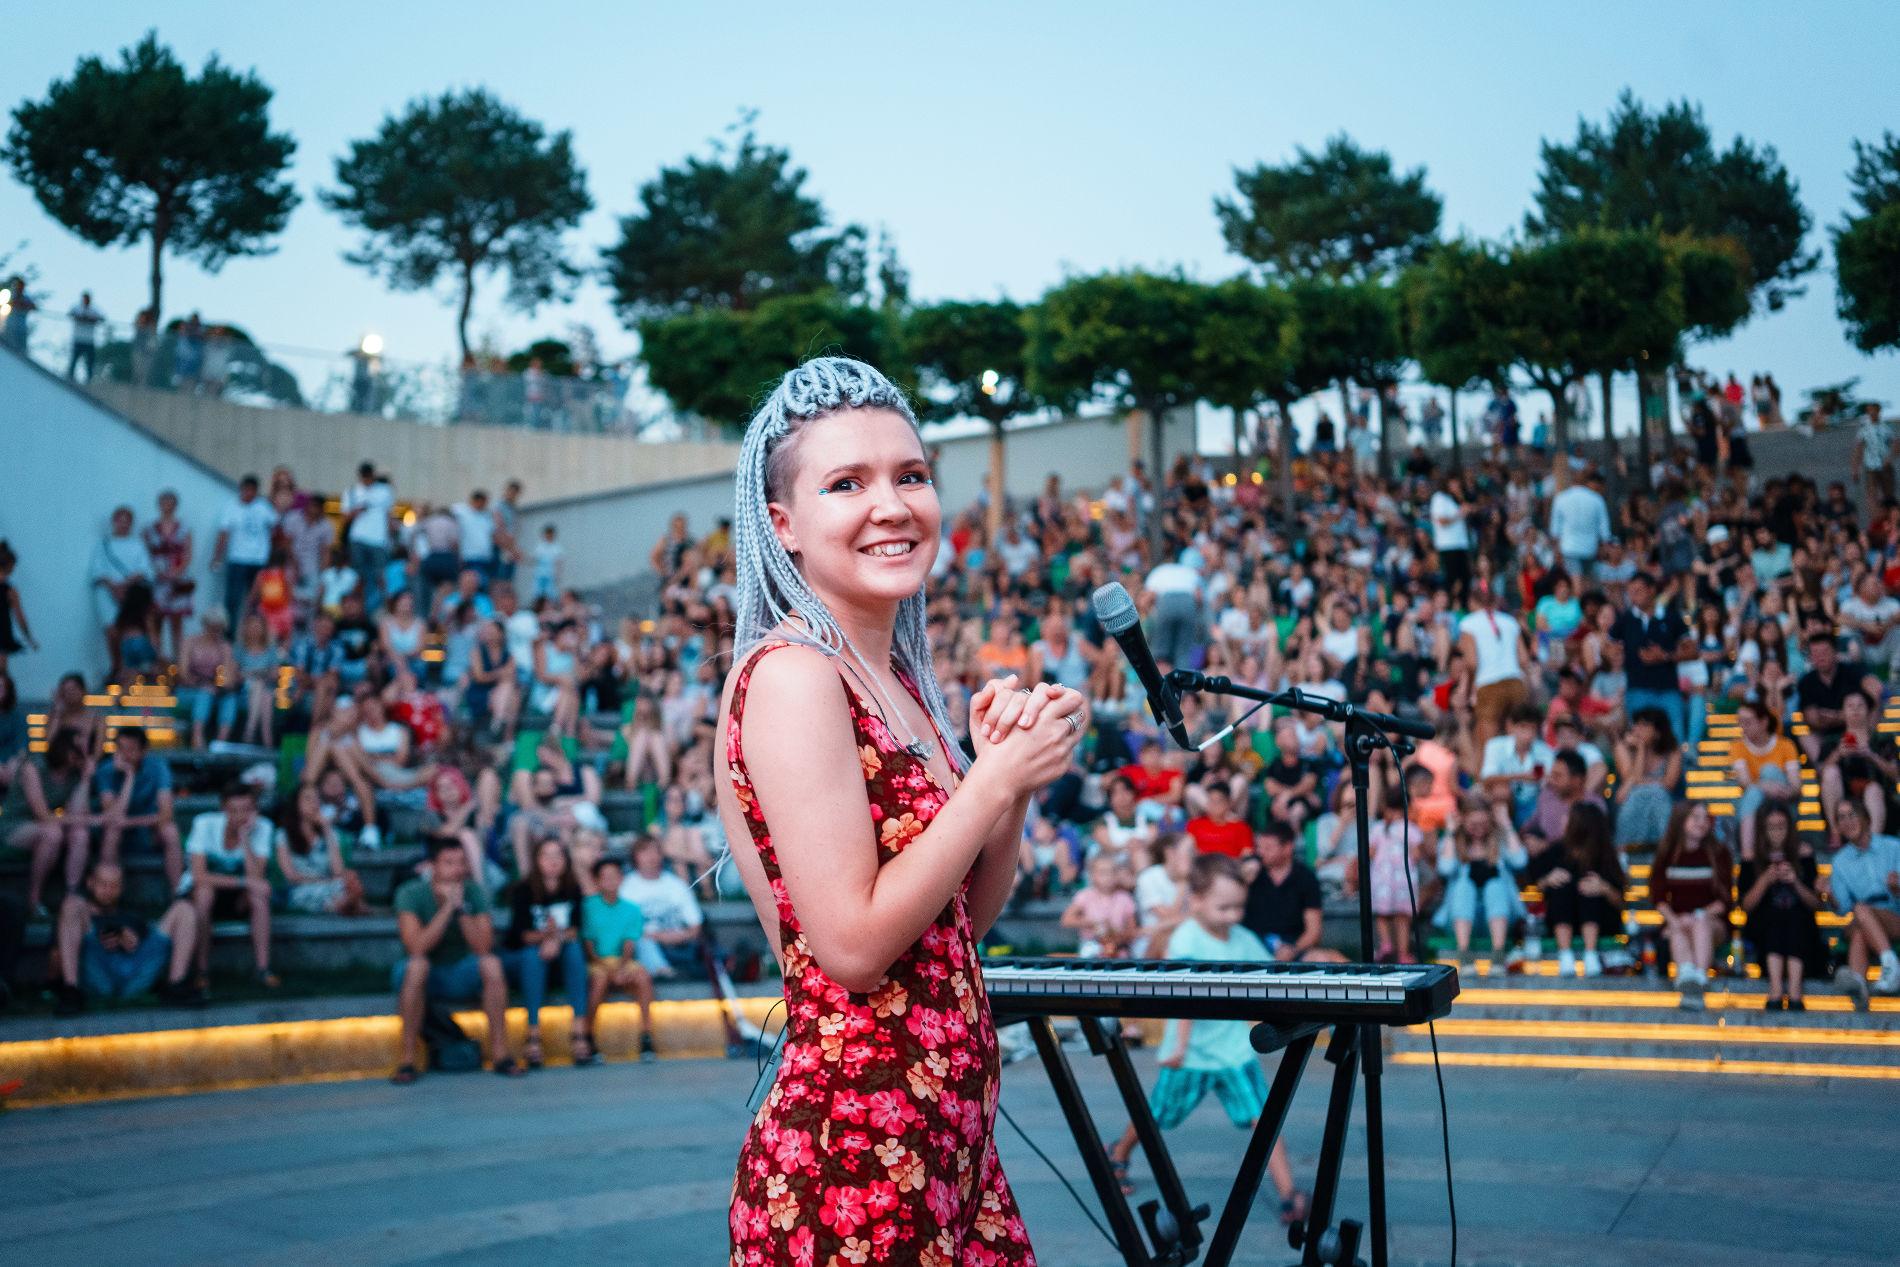 Оксана Аулова (Волуа) на концерте в парке «Краснодар» ©Фото из личного архива Оксаны Ауловой